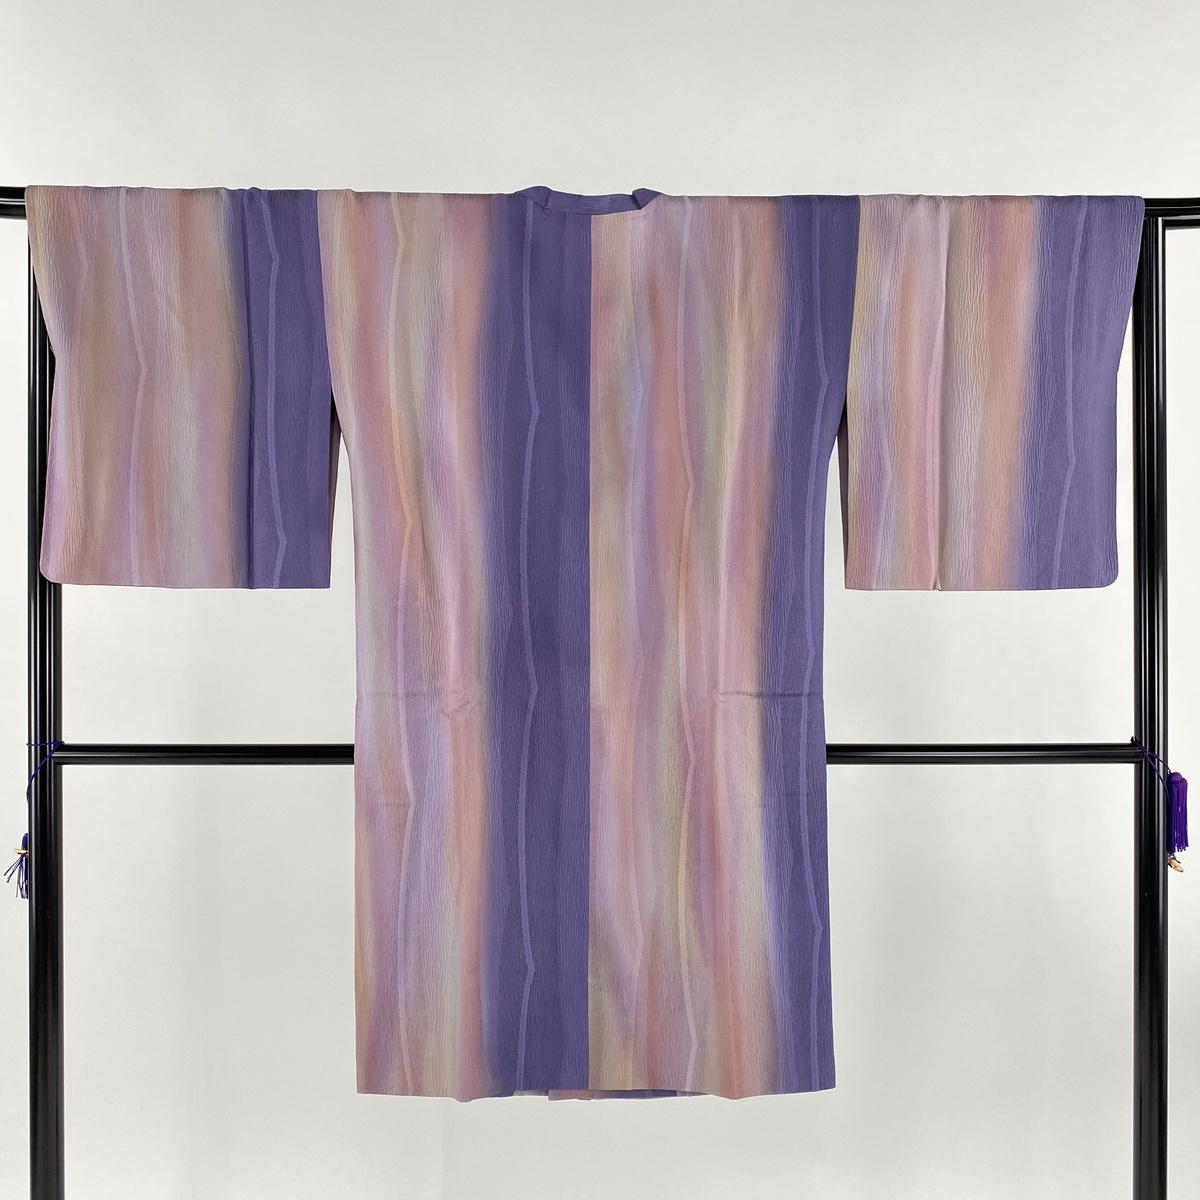 道行 美品 名品 和装コート 都衿 縦ぼかし 幾何学模様 紫 身丈106cm 裄丈66.5cm M 正絹 【中古】